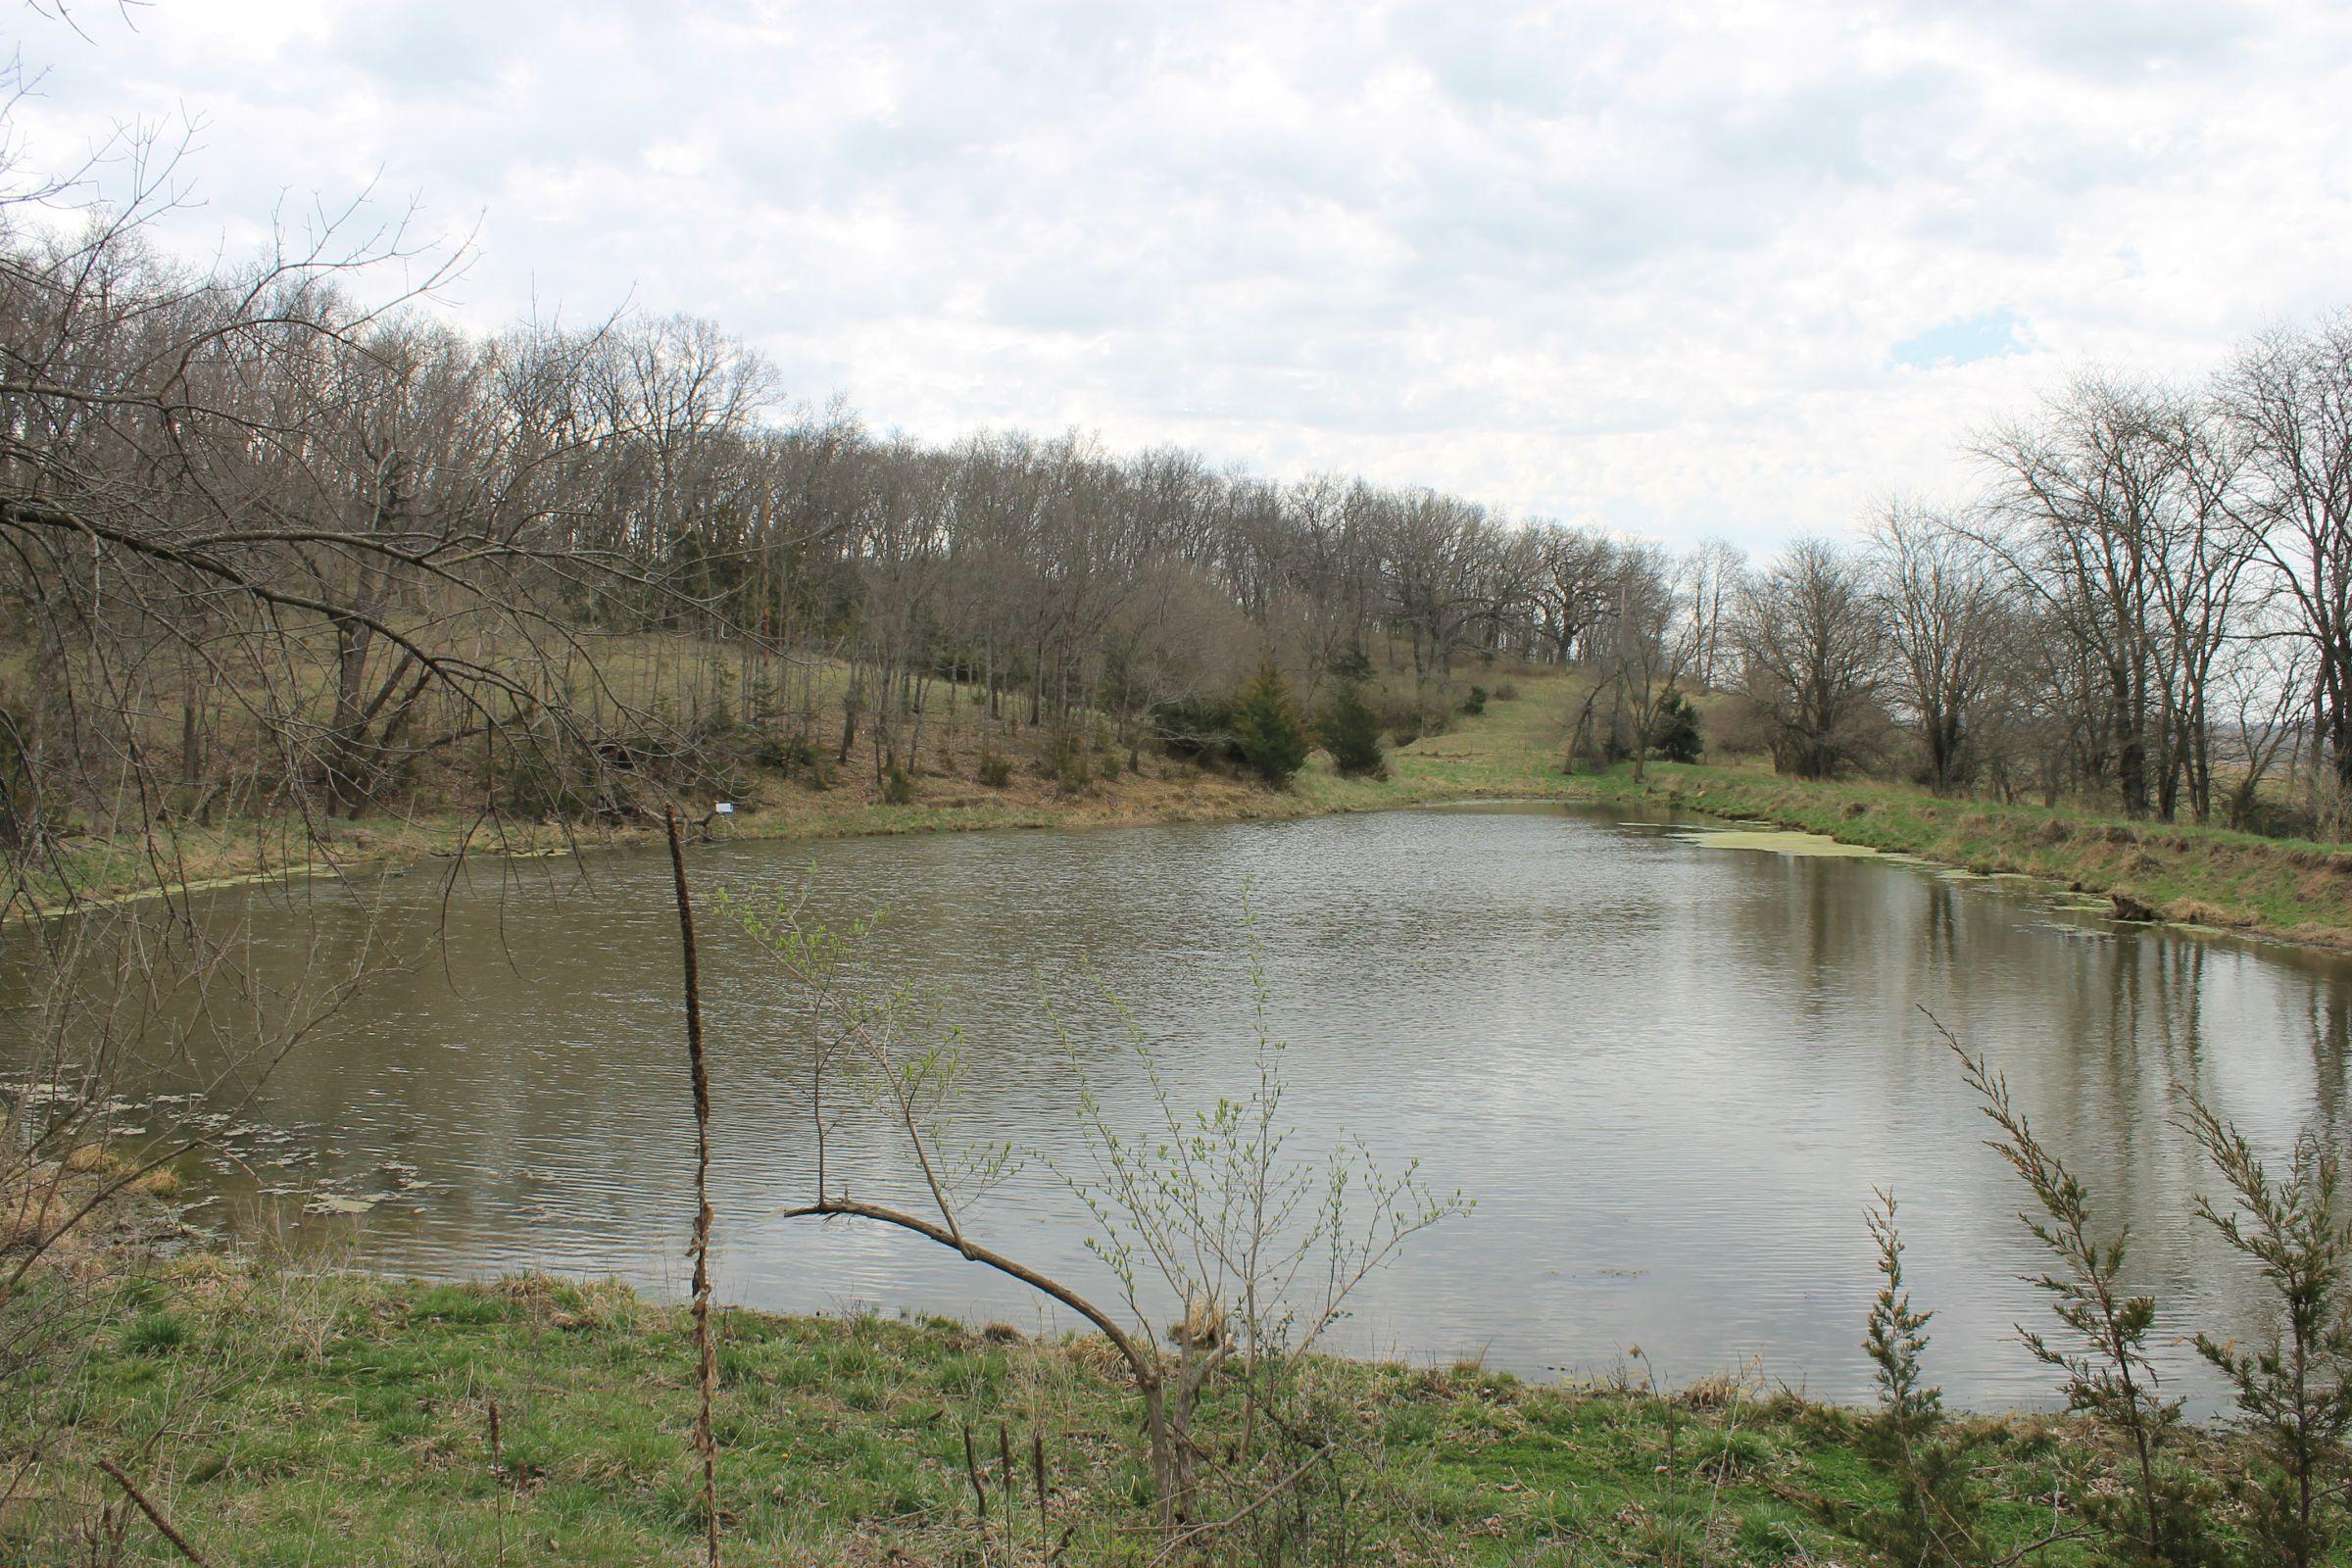 land-warren-county-iowa-186-acres-listing-number-15447-1-2021-04-09-154343.JPG